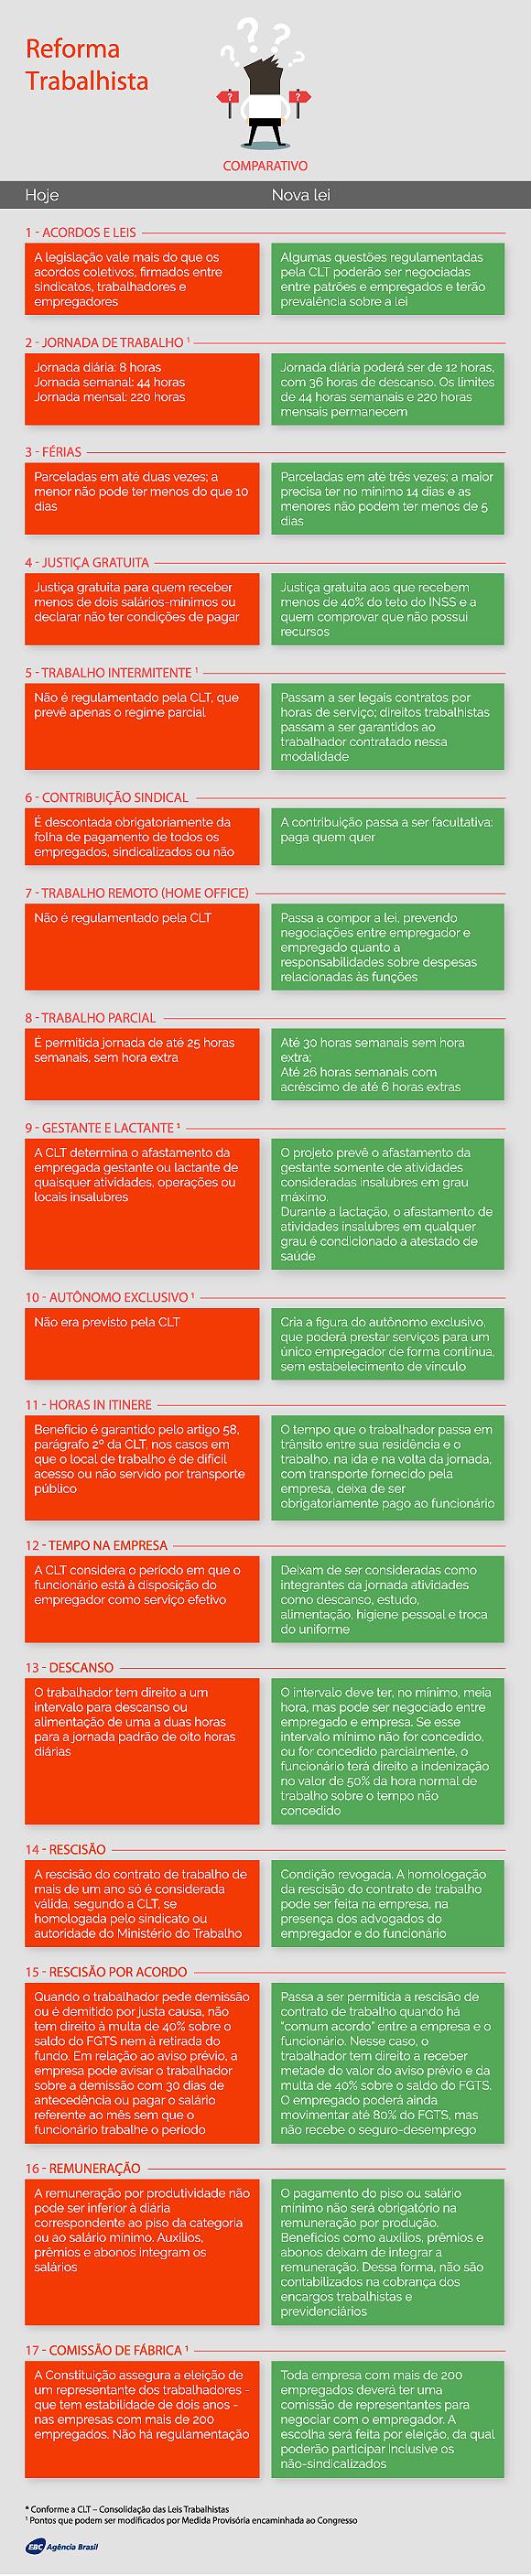 reforma-trabalhista_infografico